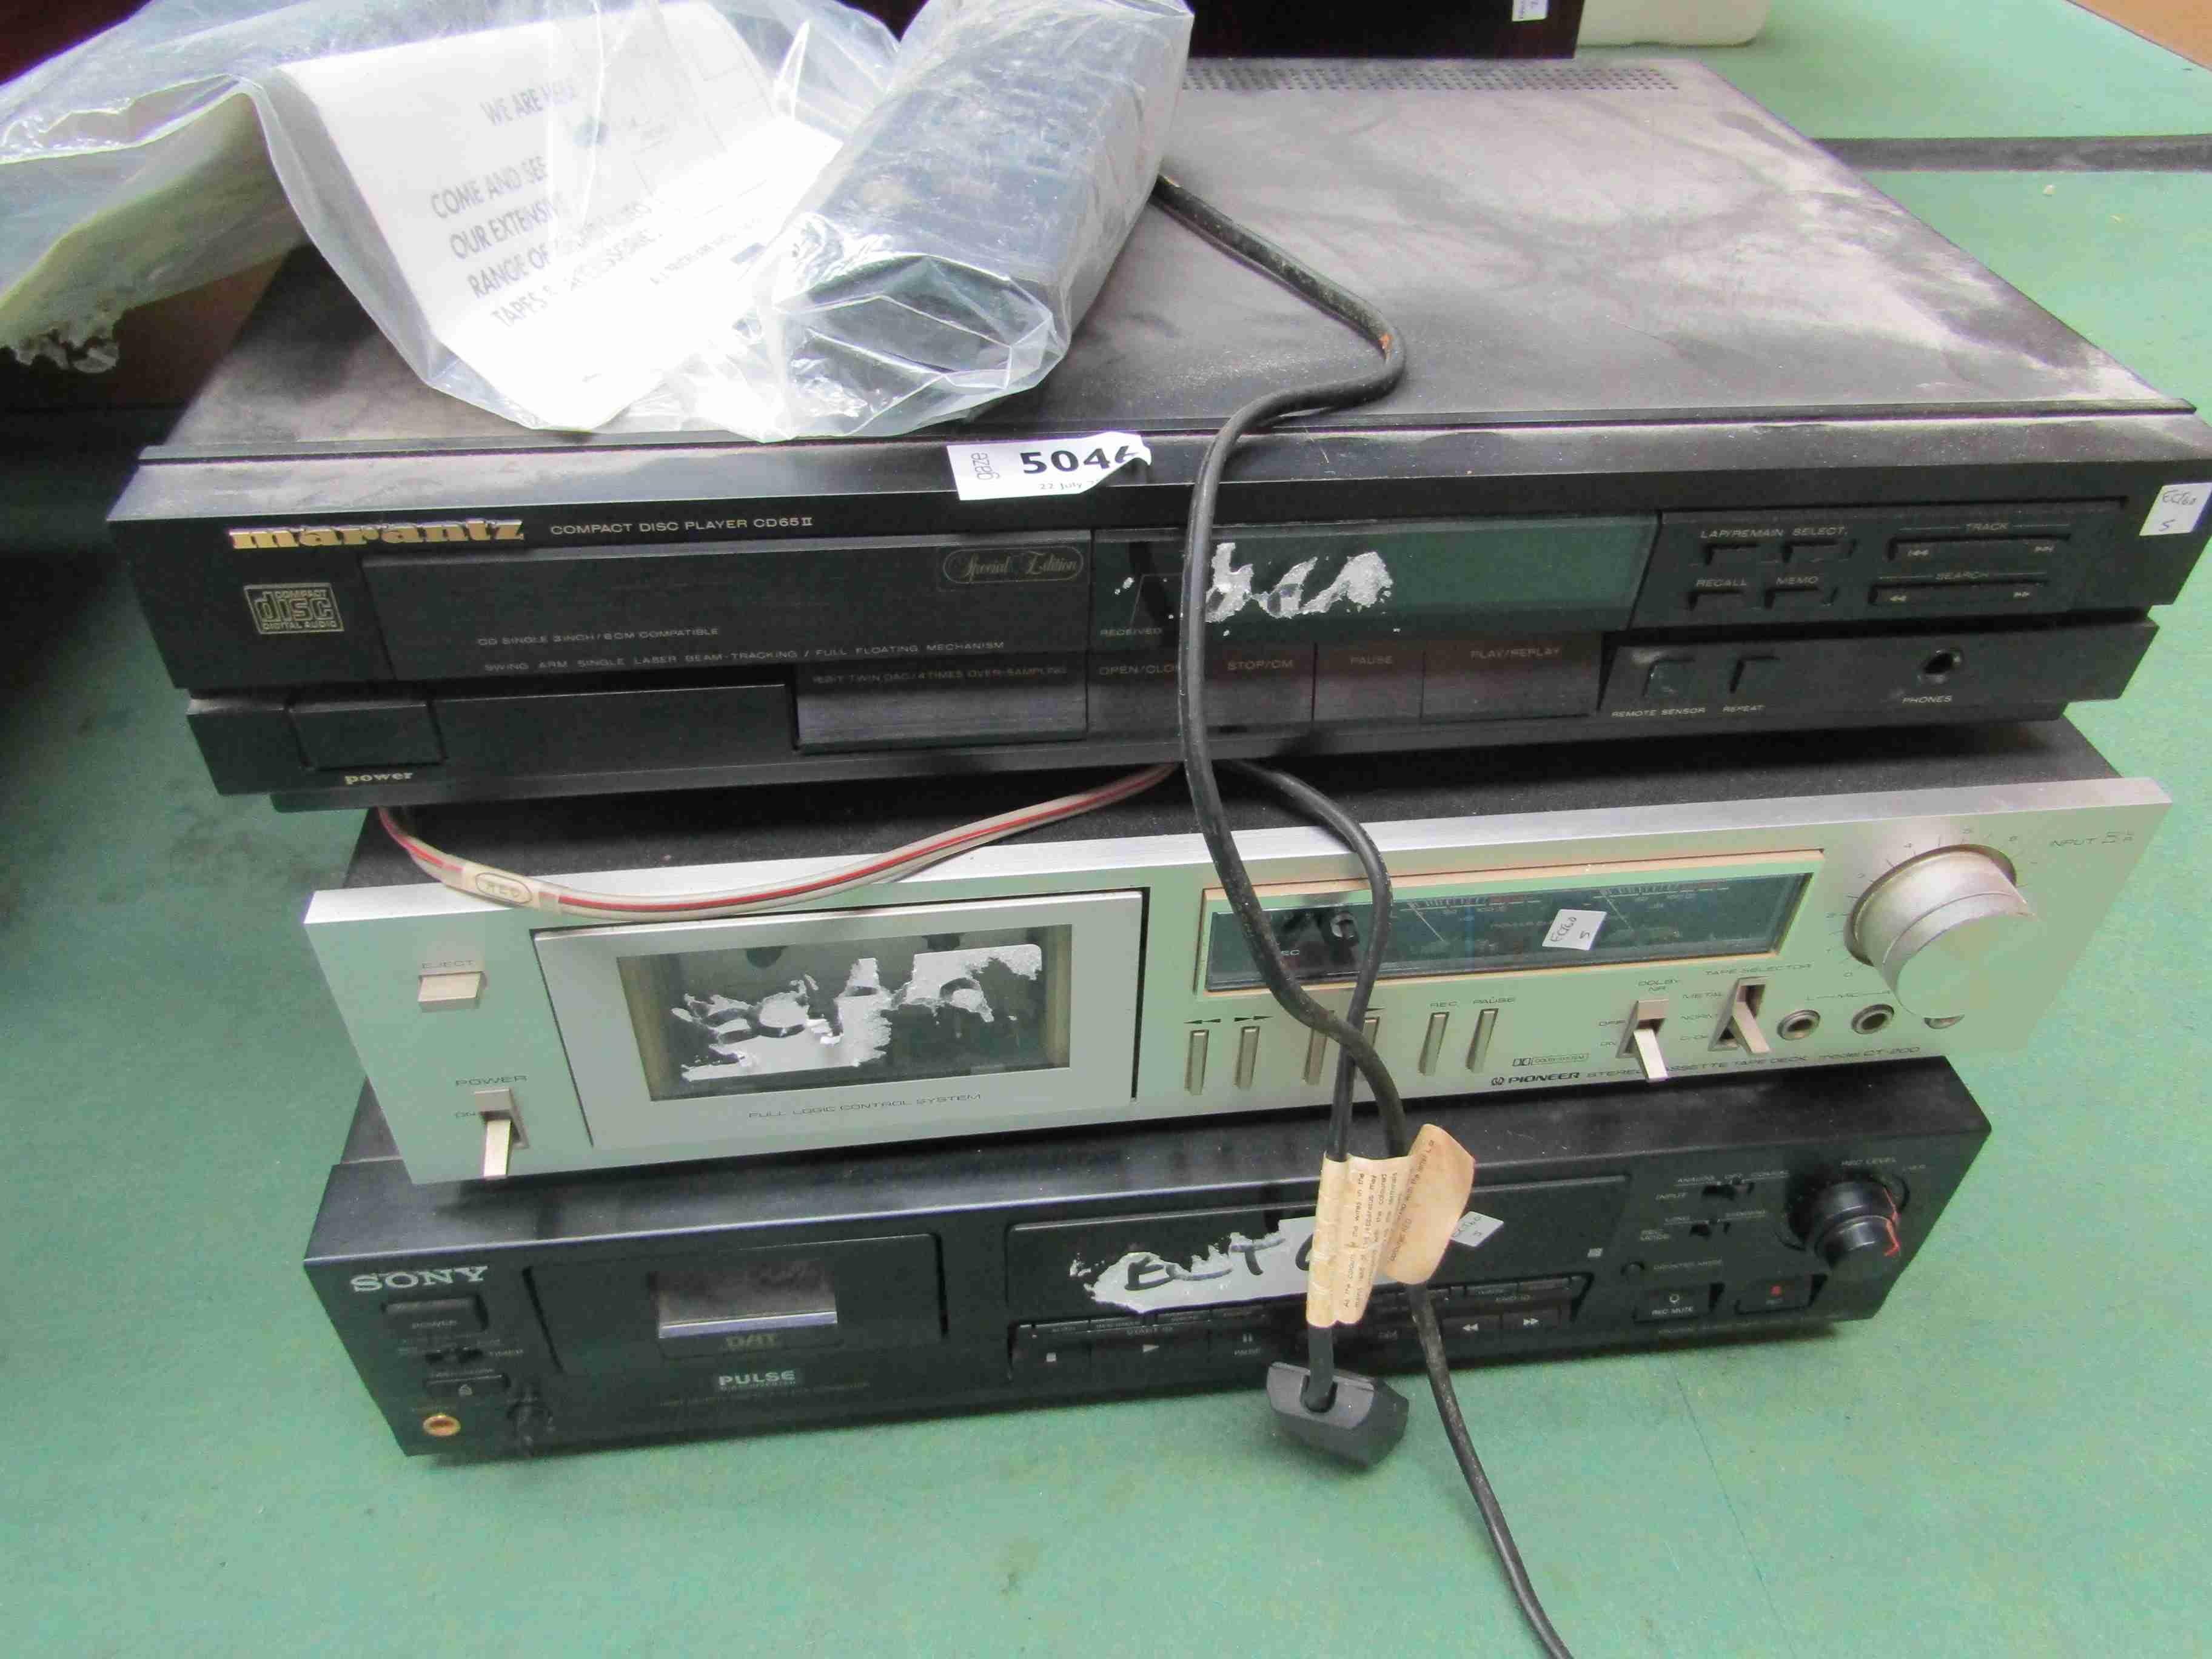 A Marantz CD65II compact disc player,